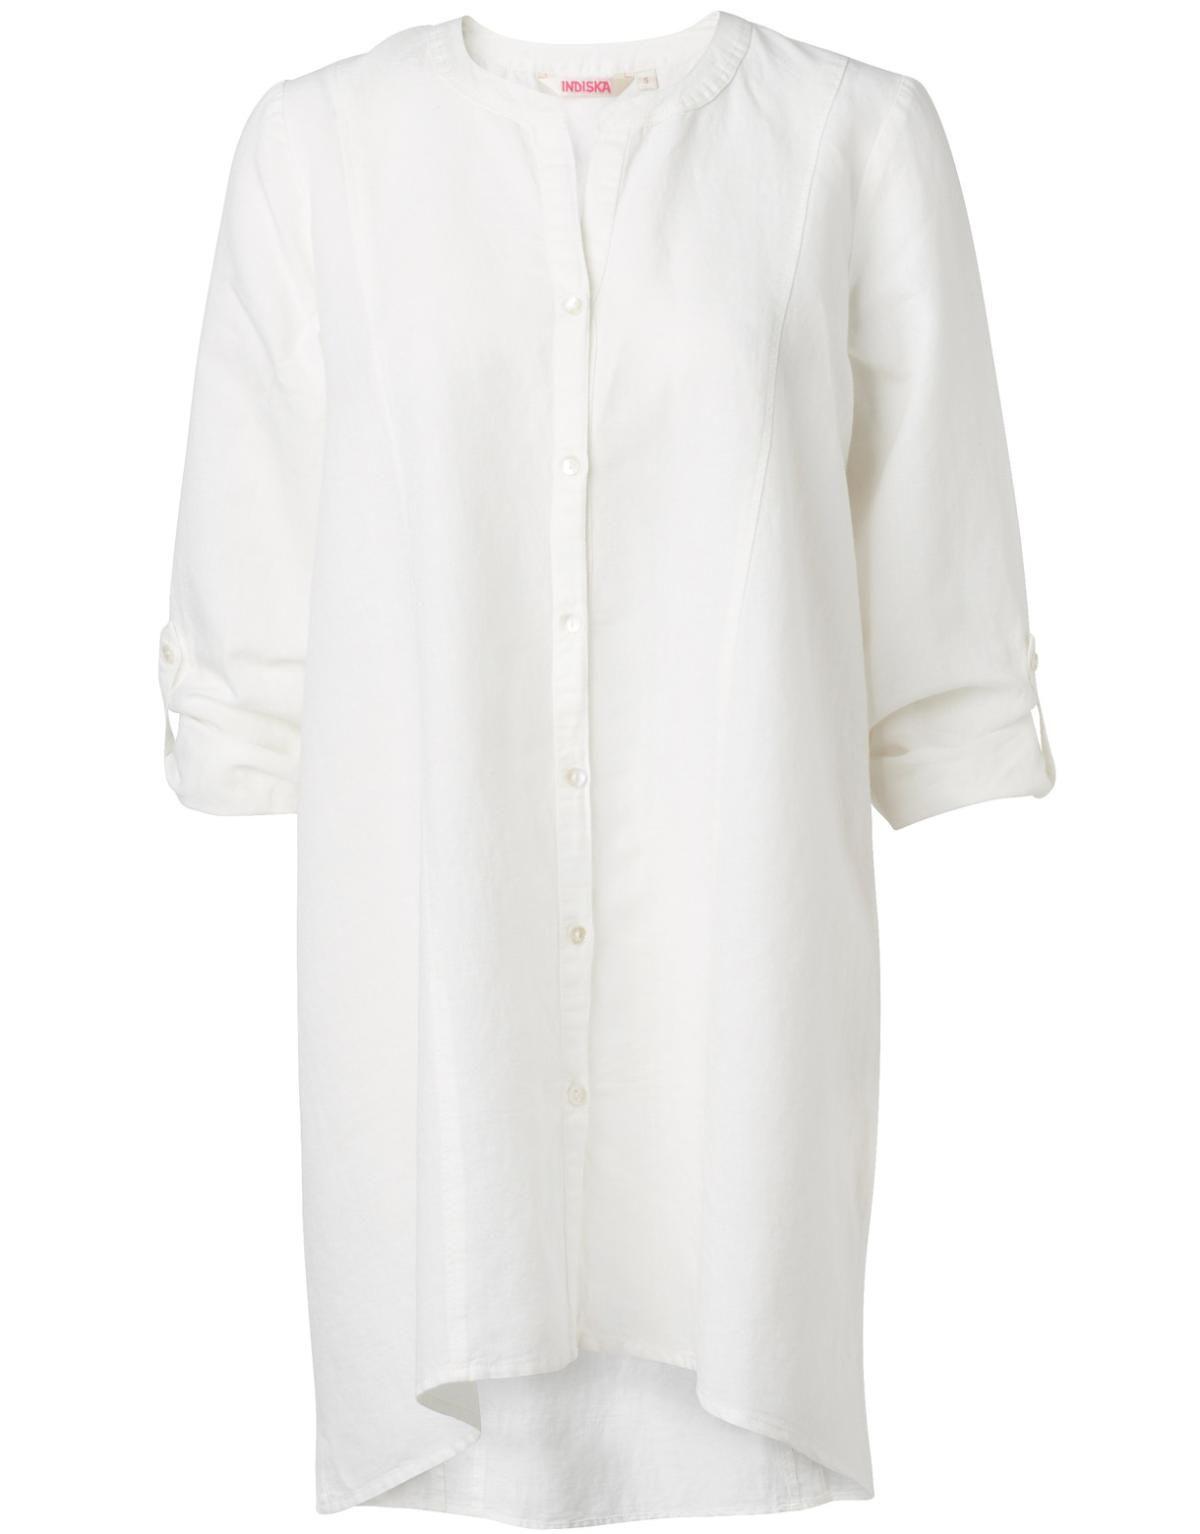 Una Tunika Offwhite Solid Tunic Tunikor Klader Indiska Shop Online Tunikor Klader Hostmode